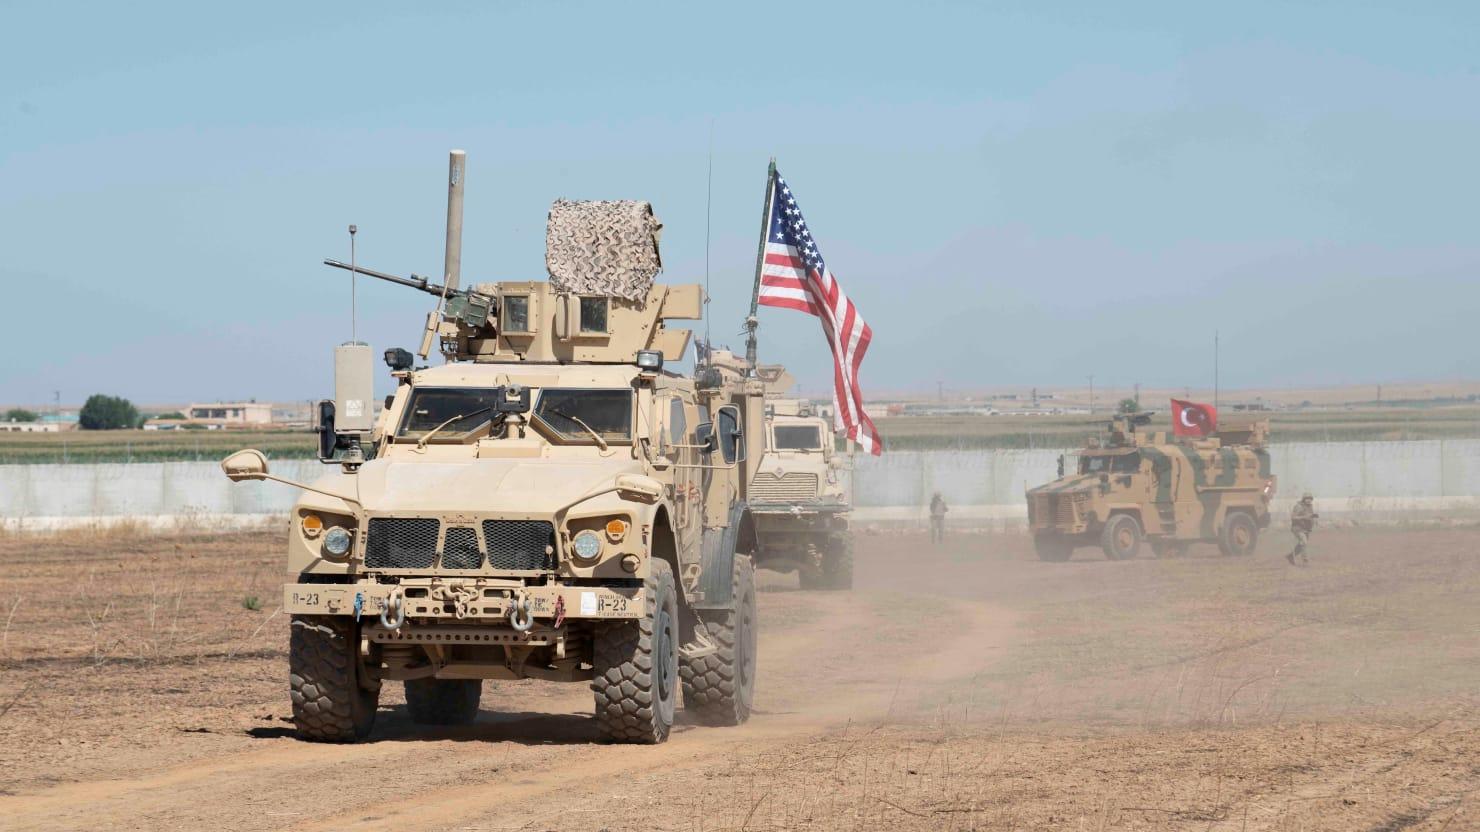 thedailybeast.com - Barbie Latza Nadeau - U.S. Troops Leaving Northern Syria Are Heading to Western Iraq